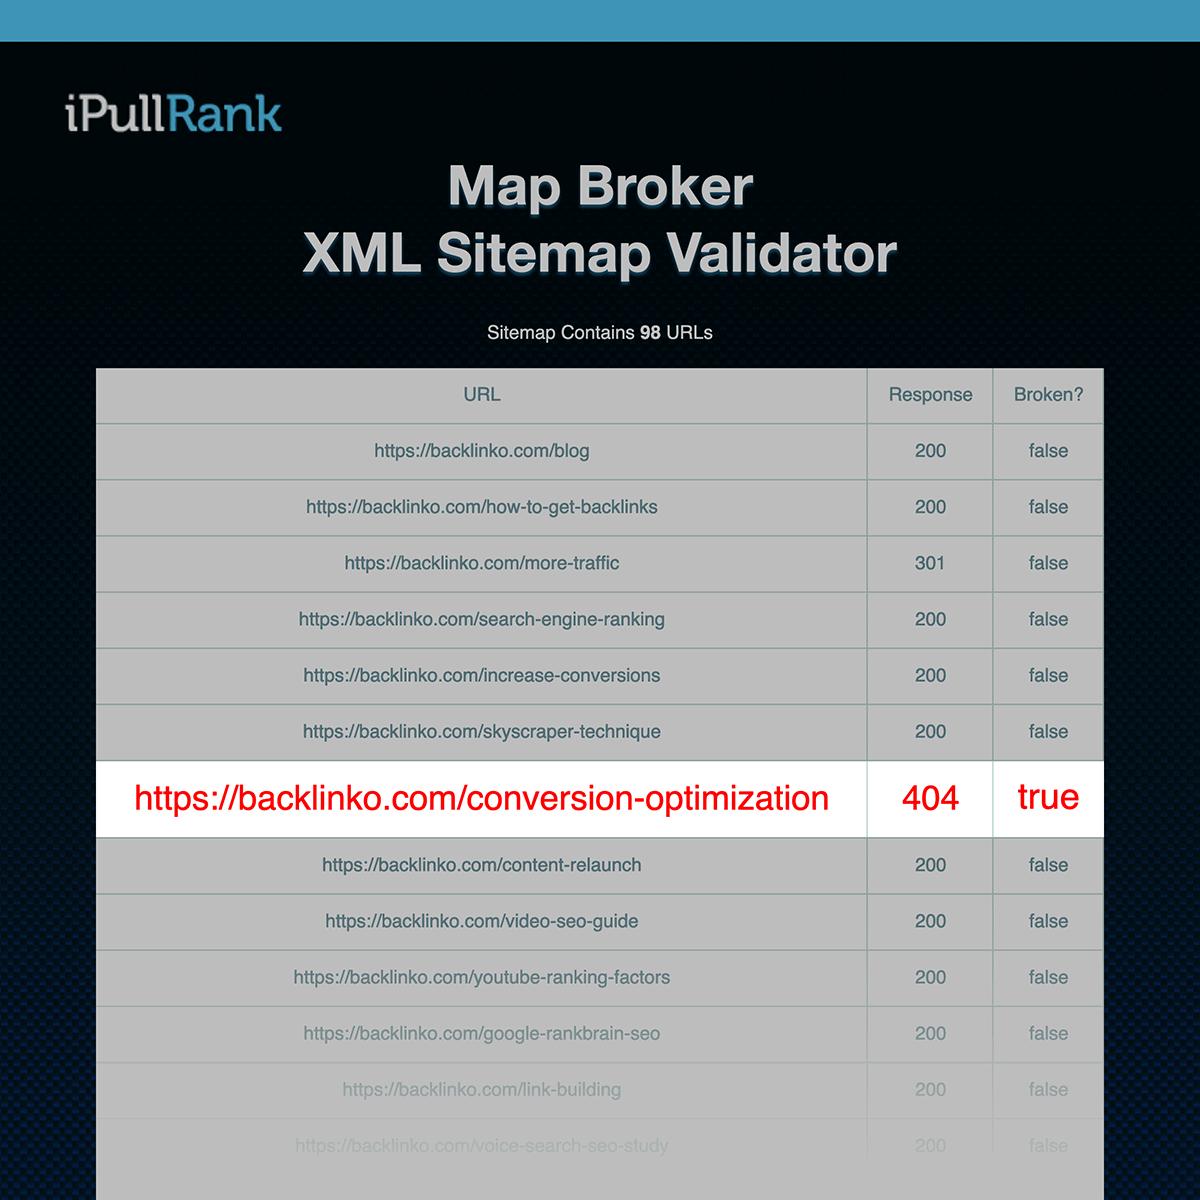 iPullRank – Results showing error